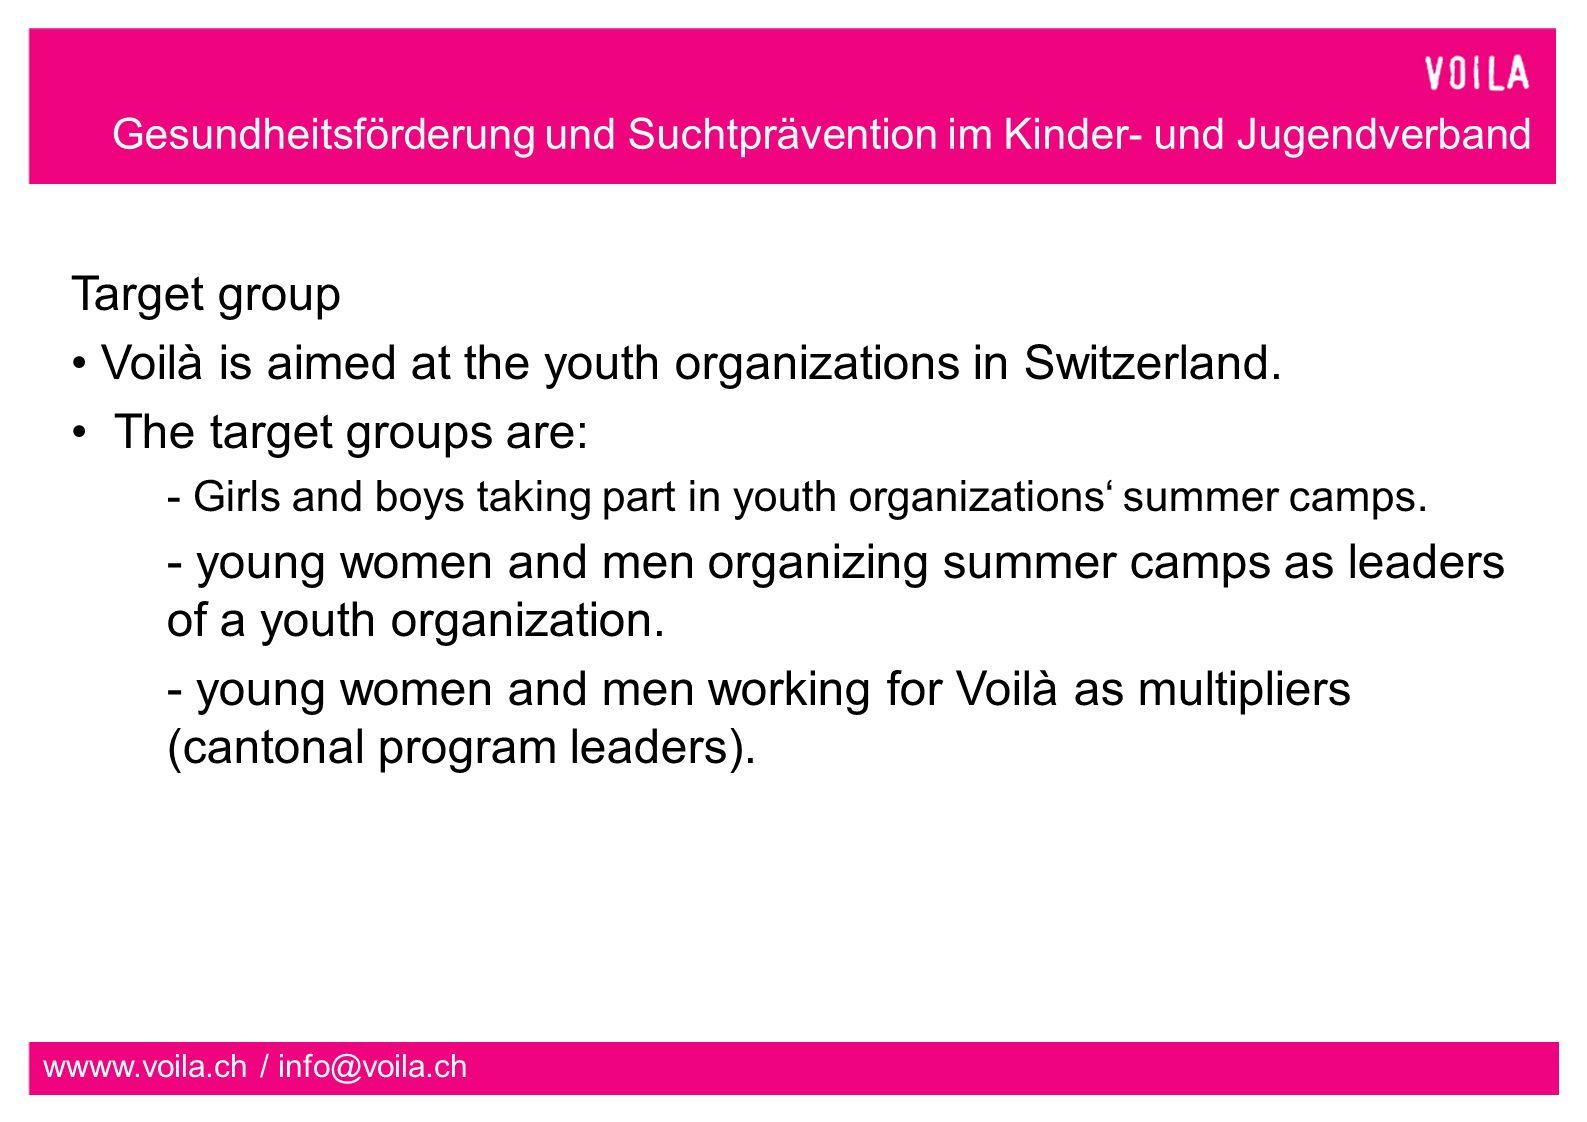 Gesundheitsförderung und Suchtprävention im Kinder- und Jugendverband wwww.voila.ch / info@voila.ch One representative from each cantonal program in each section Target group: Summer camps organized by youth organizations such as Pfadi, Blauring/Jungwacht, CEVI etc.